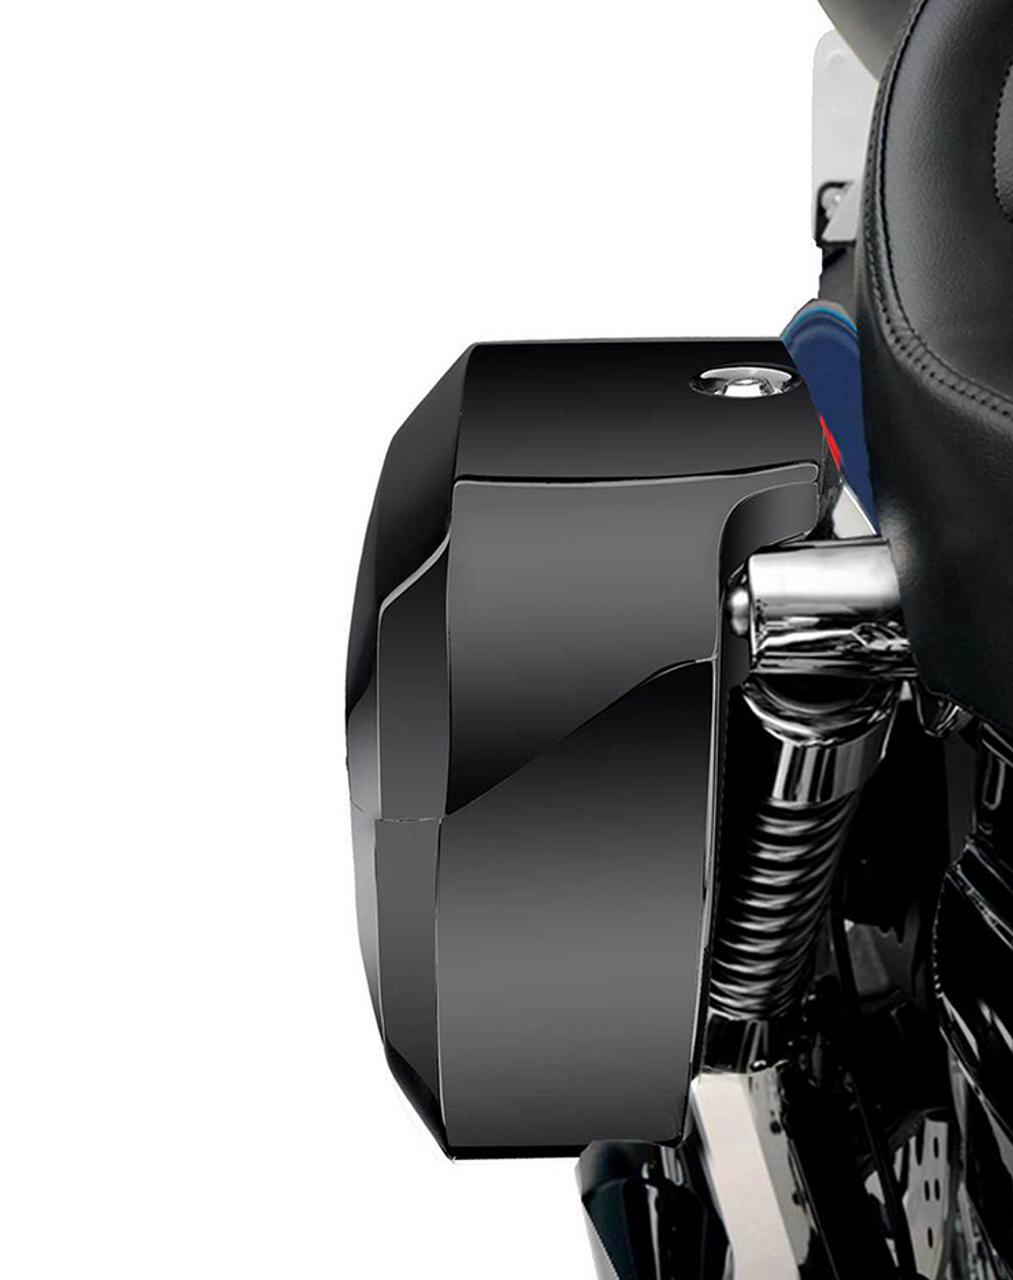 Honda VTX 1800 F Viking Lamellar Large Spear Shock Cutout Hard Saddlebags Shock Cutout View